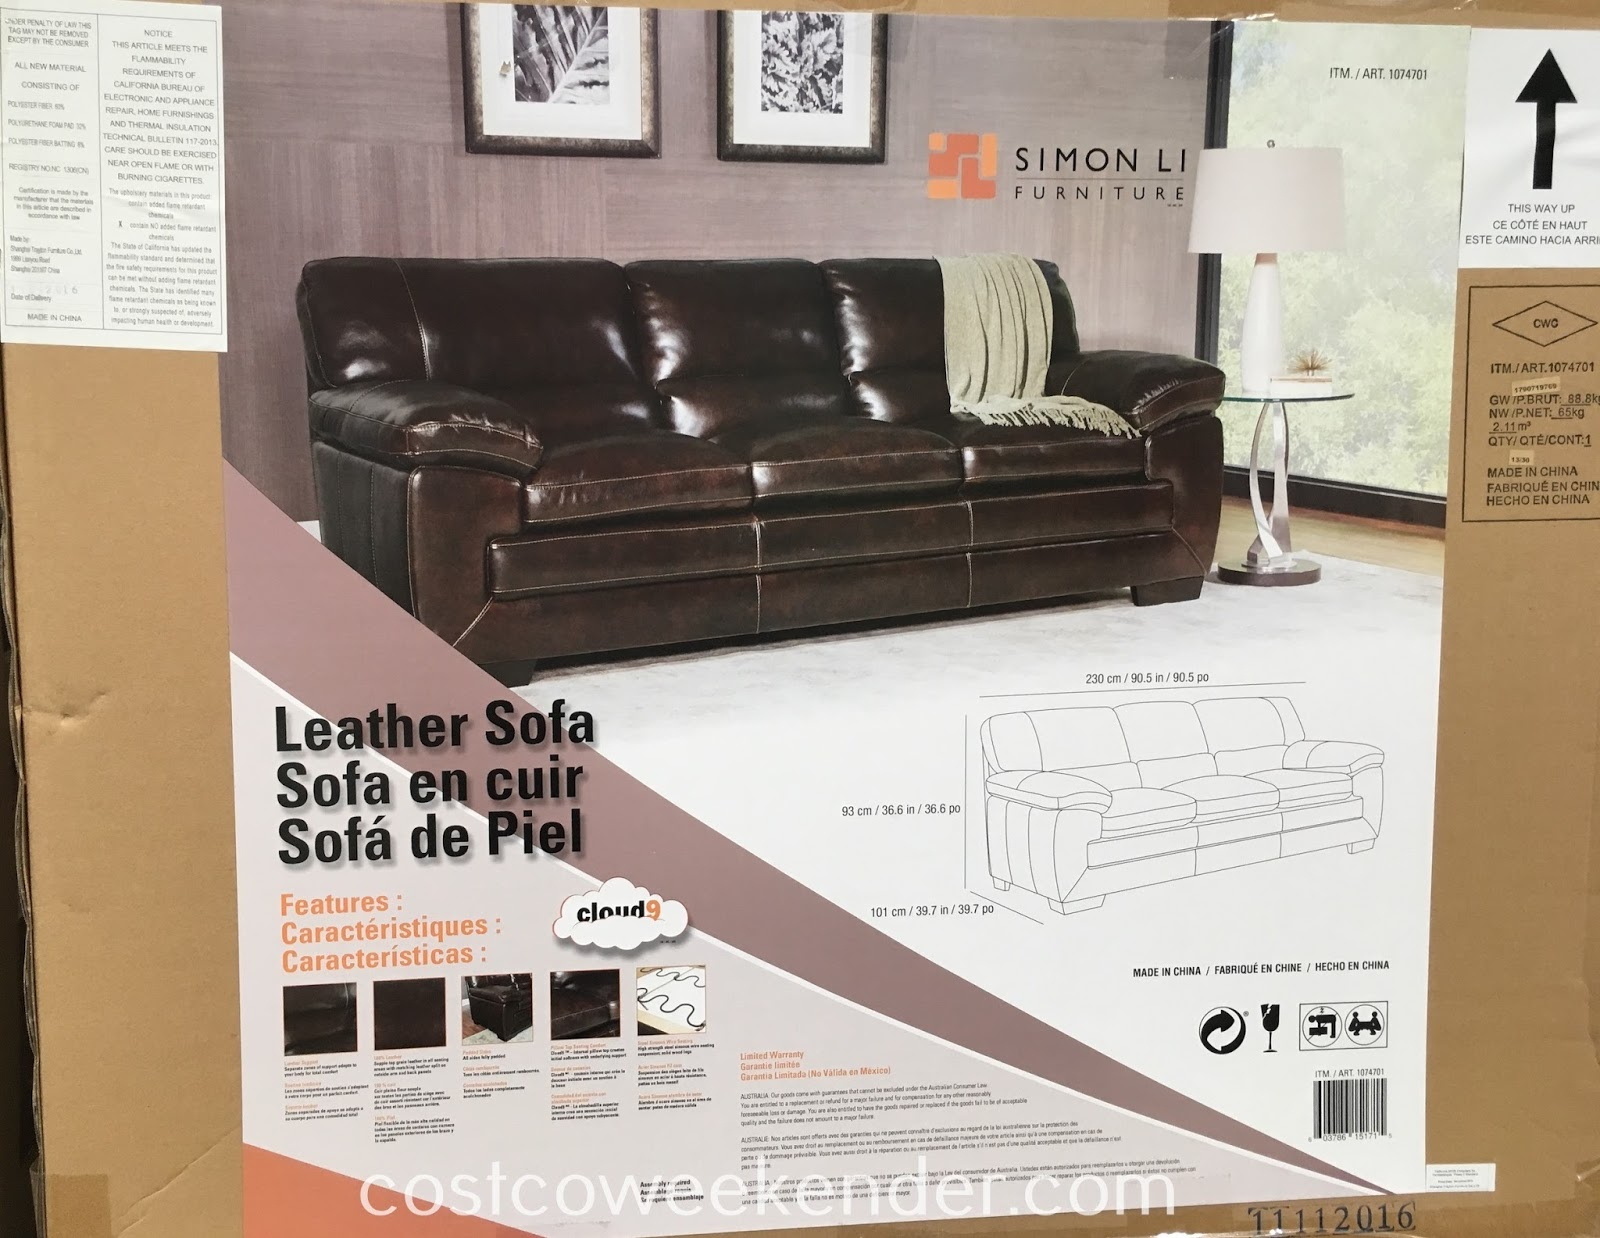 sofa costco ca shabby chic cushions simon li furniture leather weekender